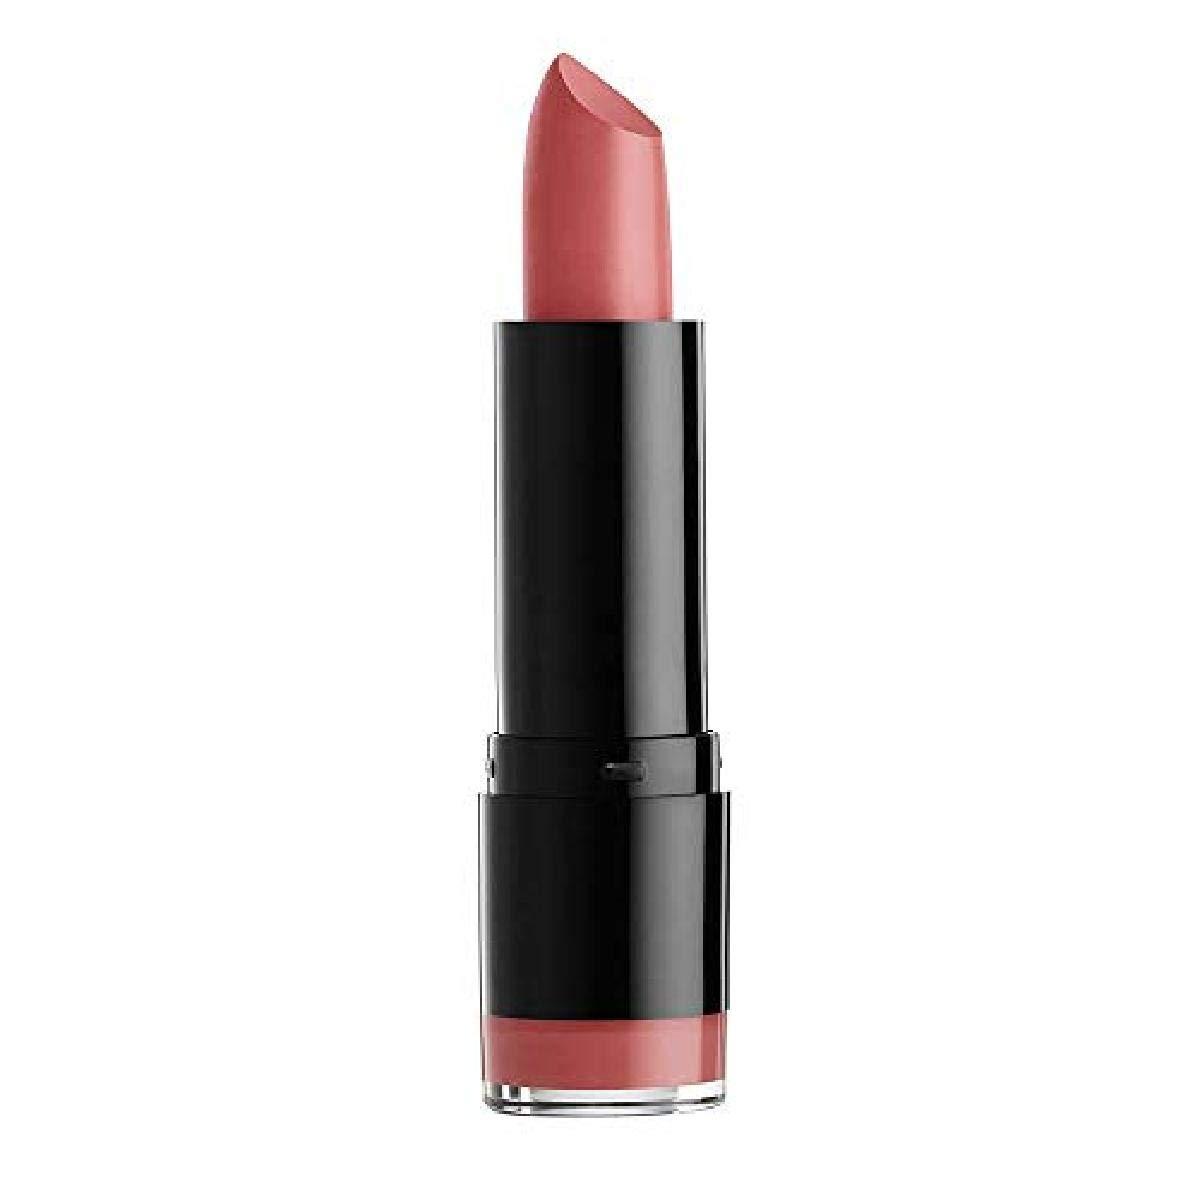 NYX PROFESSIONAL MAKEUP Extra Creamy Round Lipstick - B52, Soft Mauve-Pink